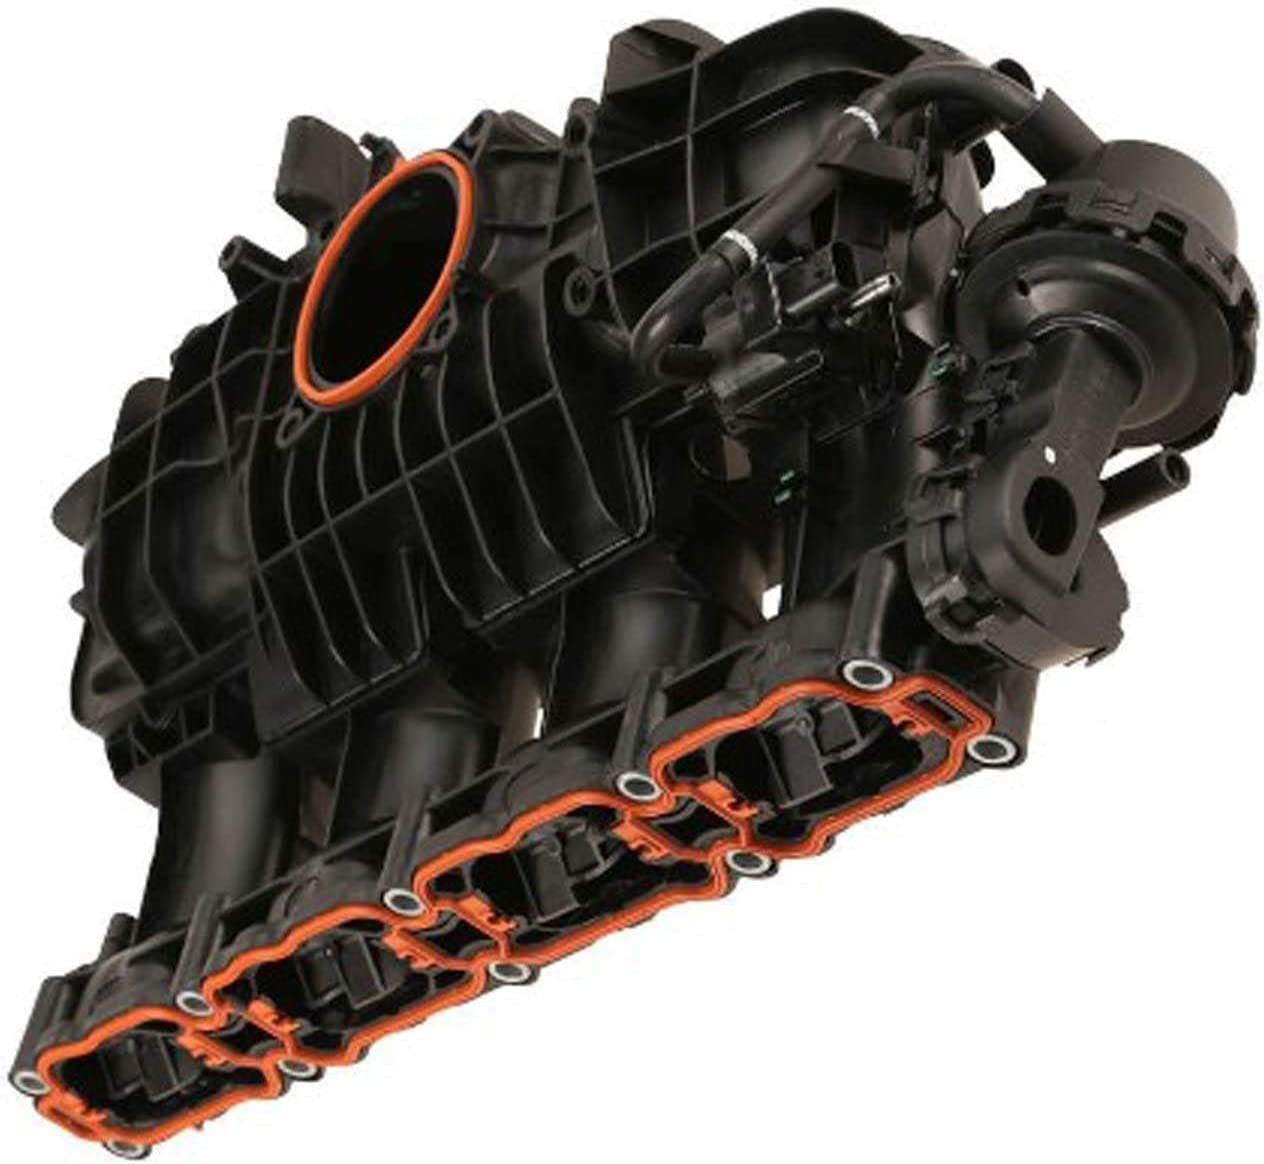 Genuine OEM Engine Over item handling Intake for Manifold Audi Oklahoma City Mall 06L133201BB